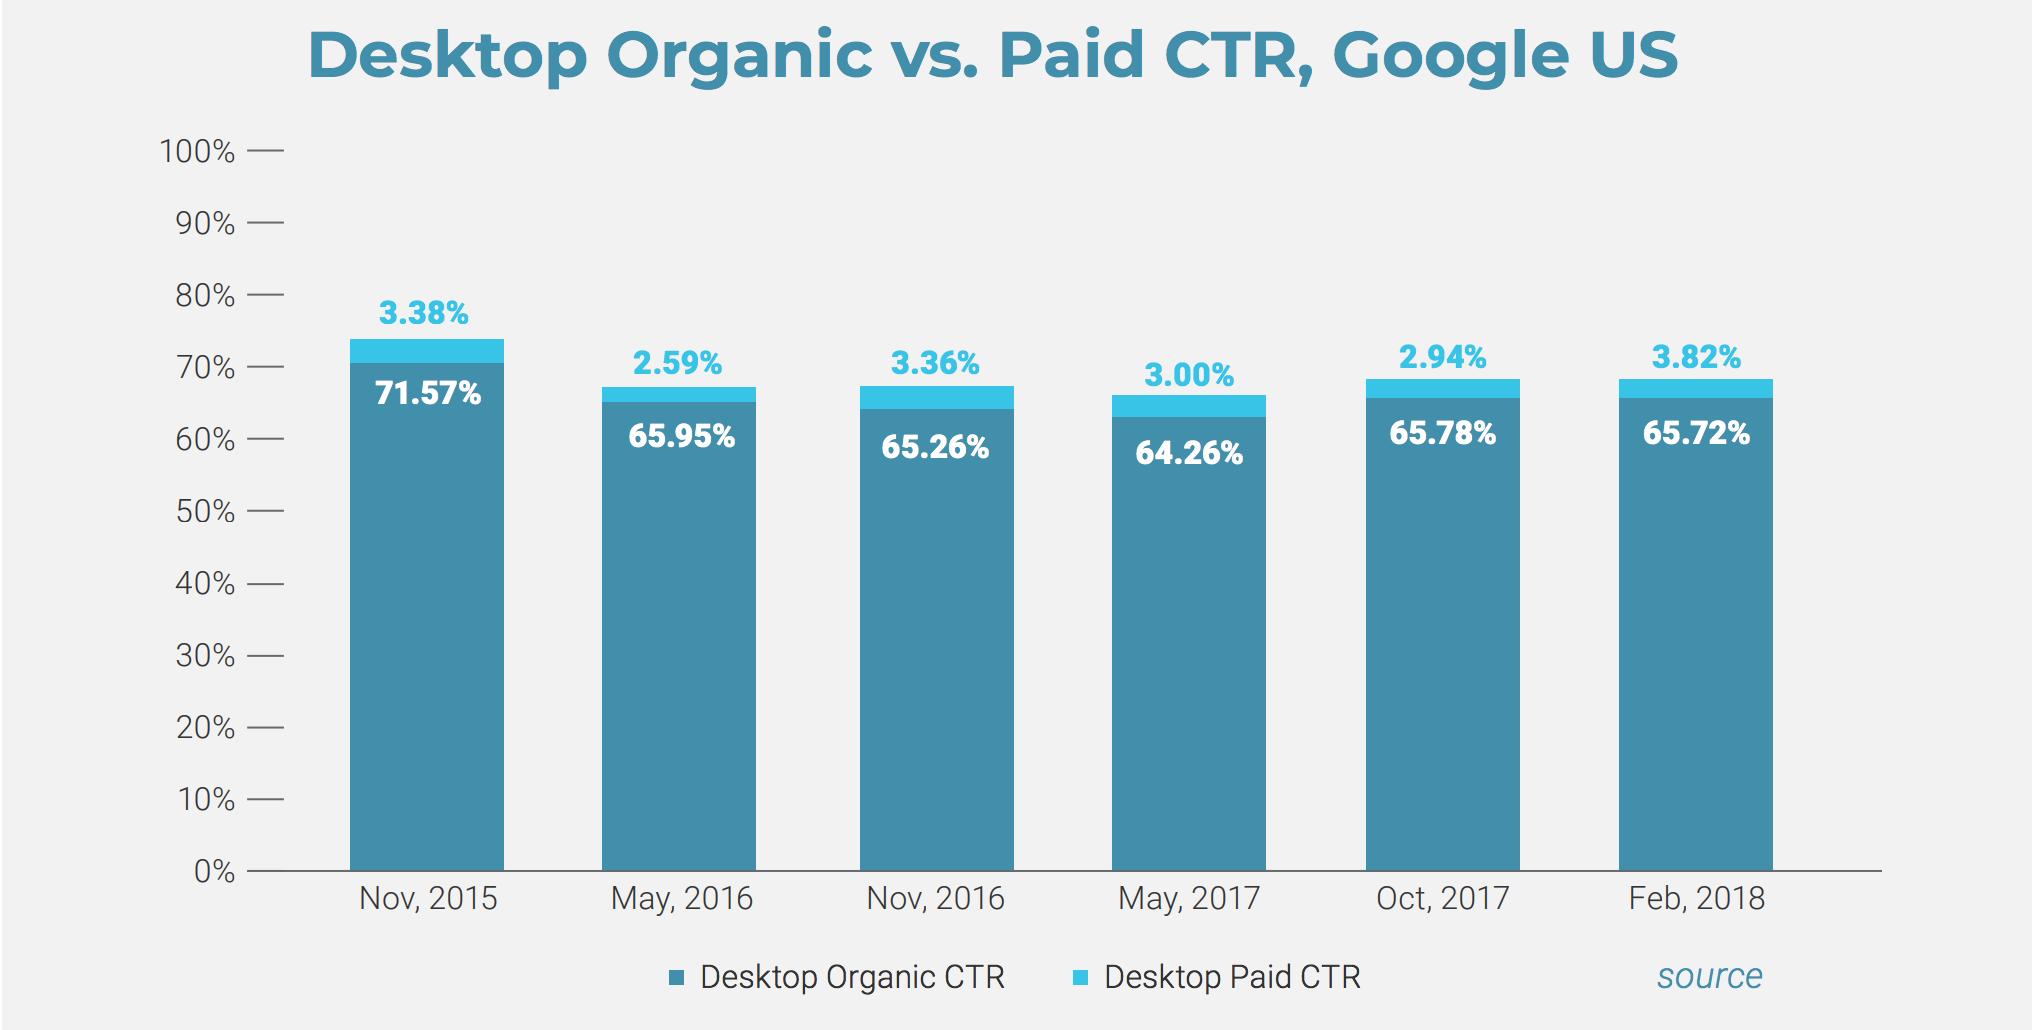 Desktop-Organic-vs.-Paid-Click-through-rate--Google-US-